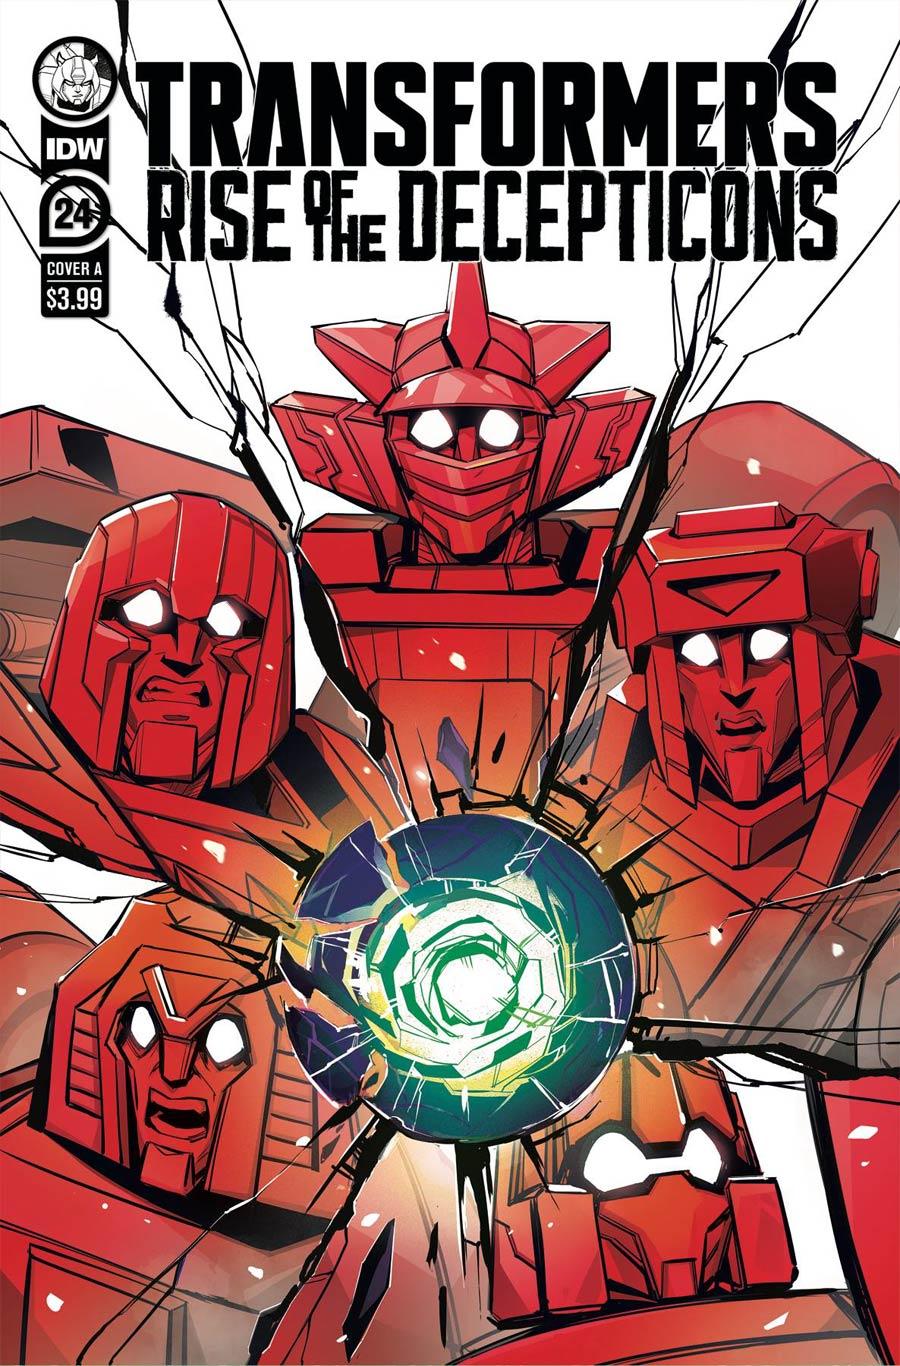 Transformers Vol 4 #24 Cover A Regular Beth McGuire-Smith Cover